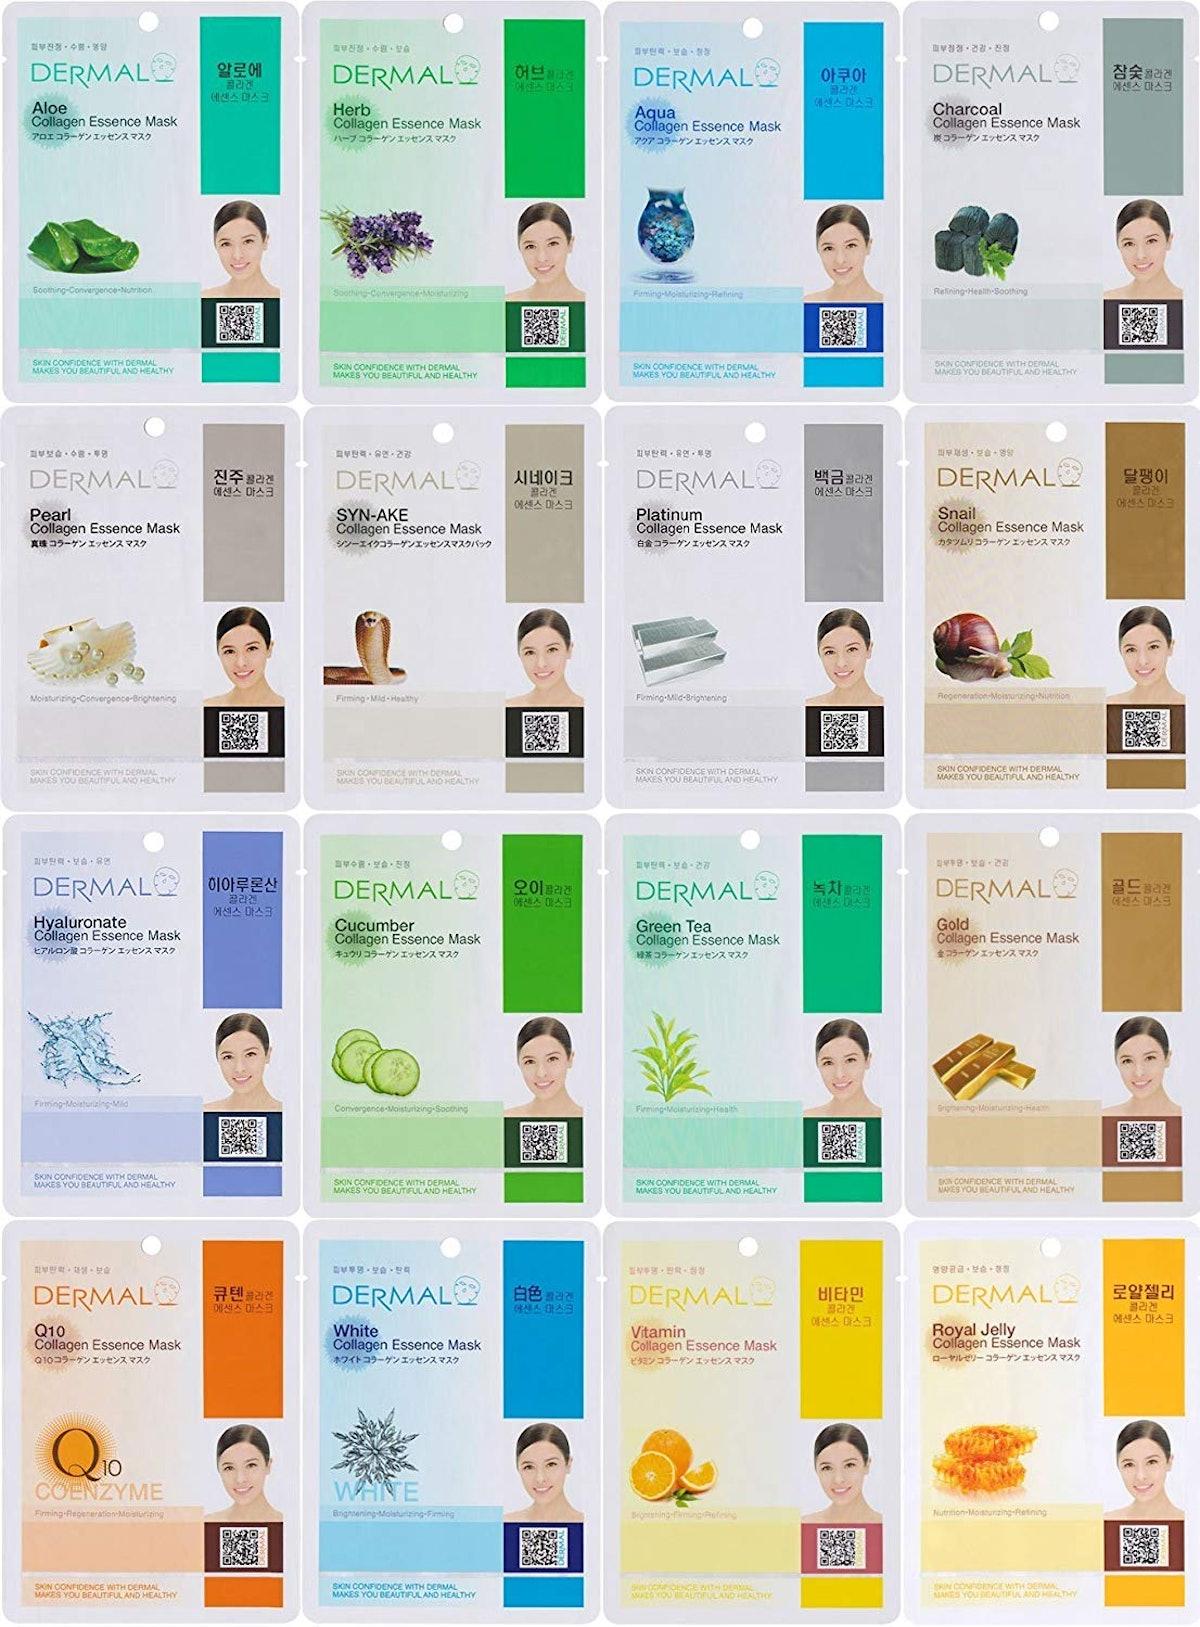 DERMAL Facial Mask Sheets (16 Pack)